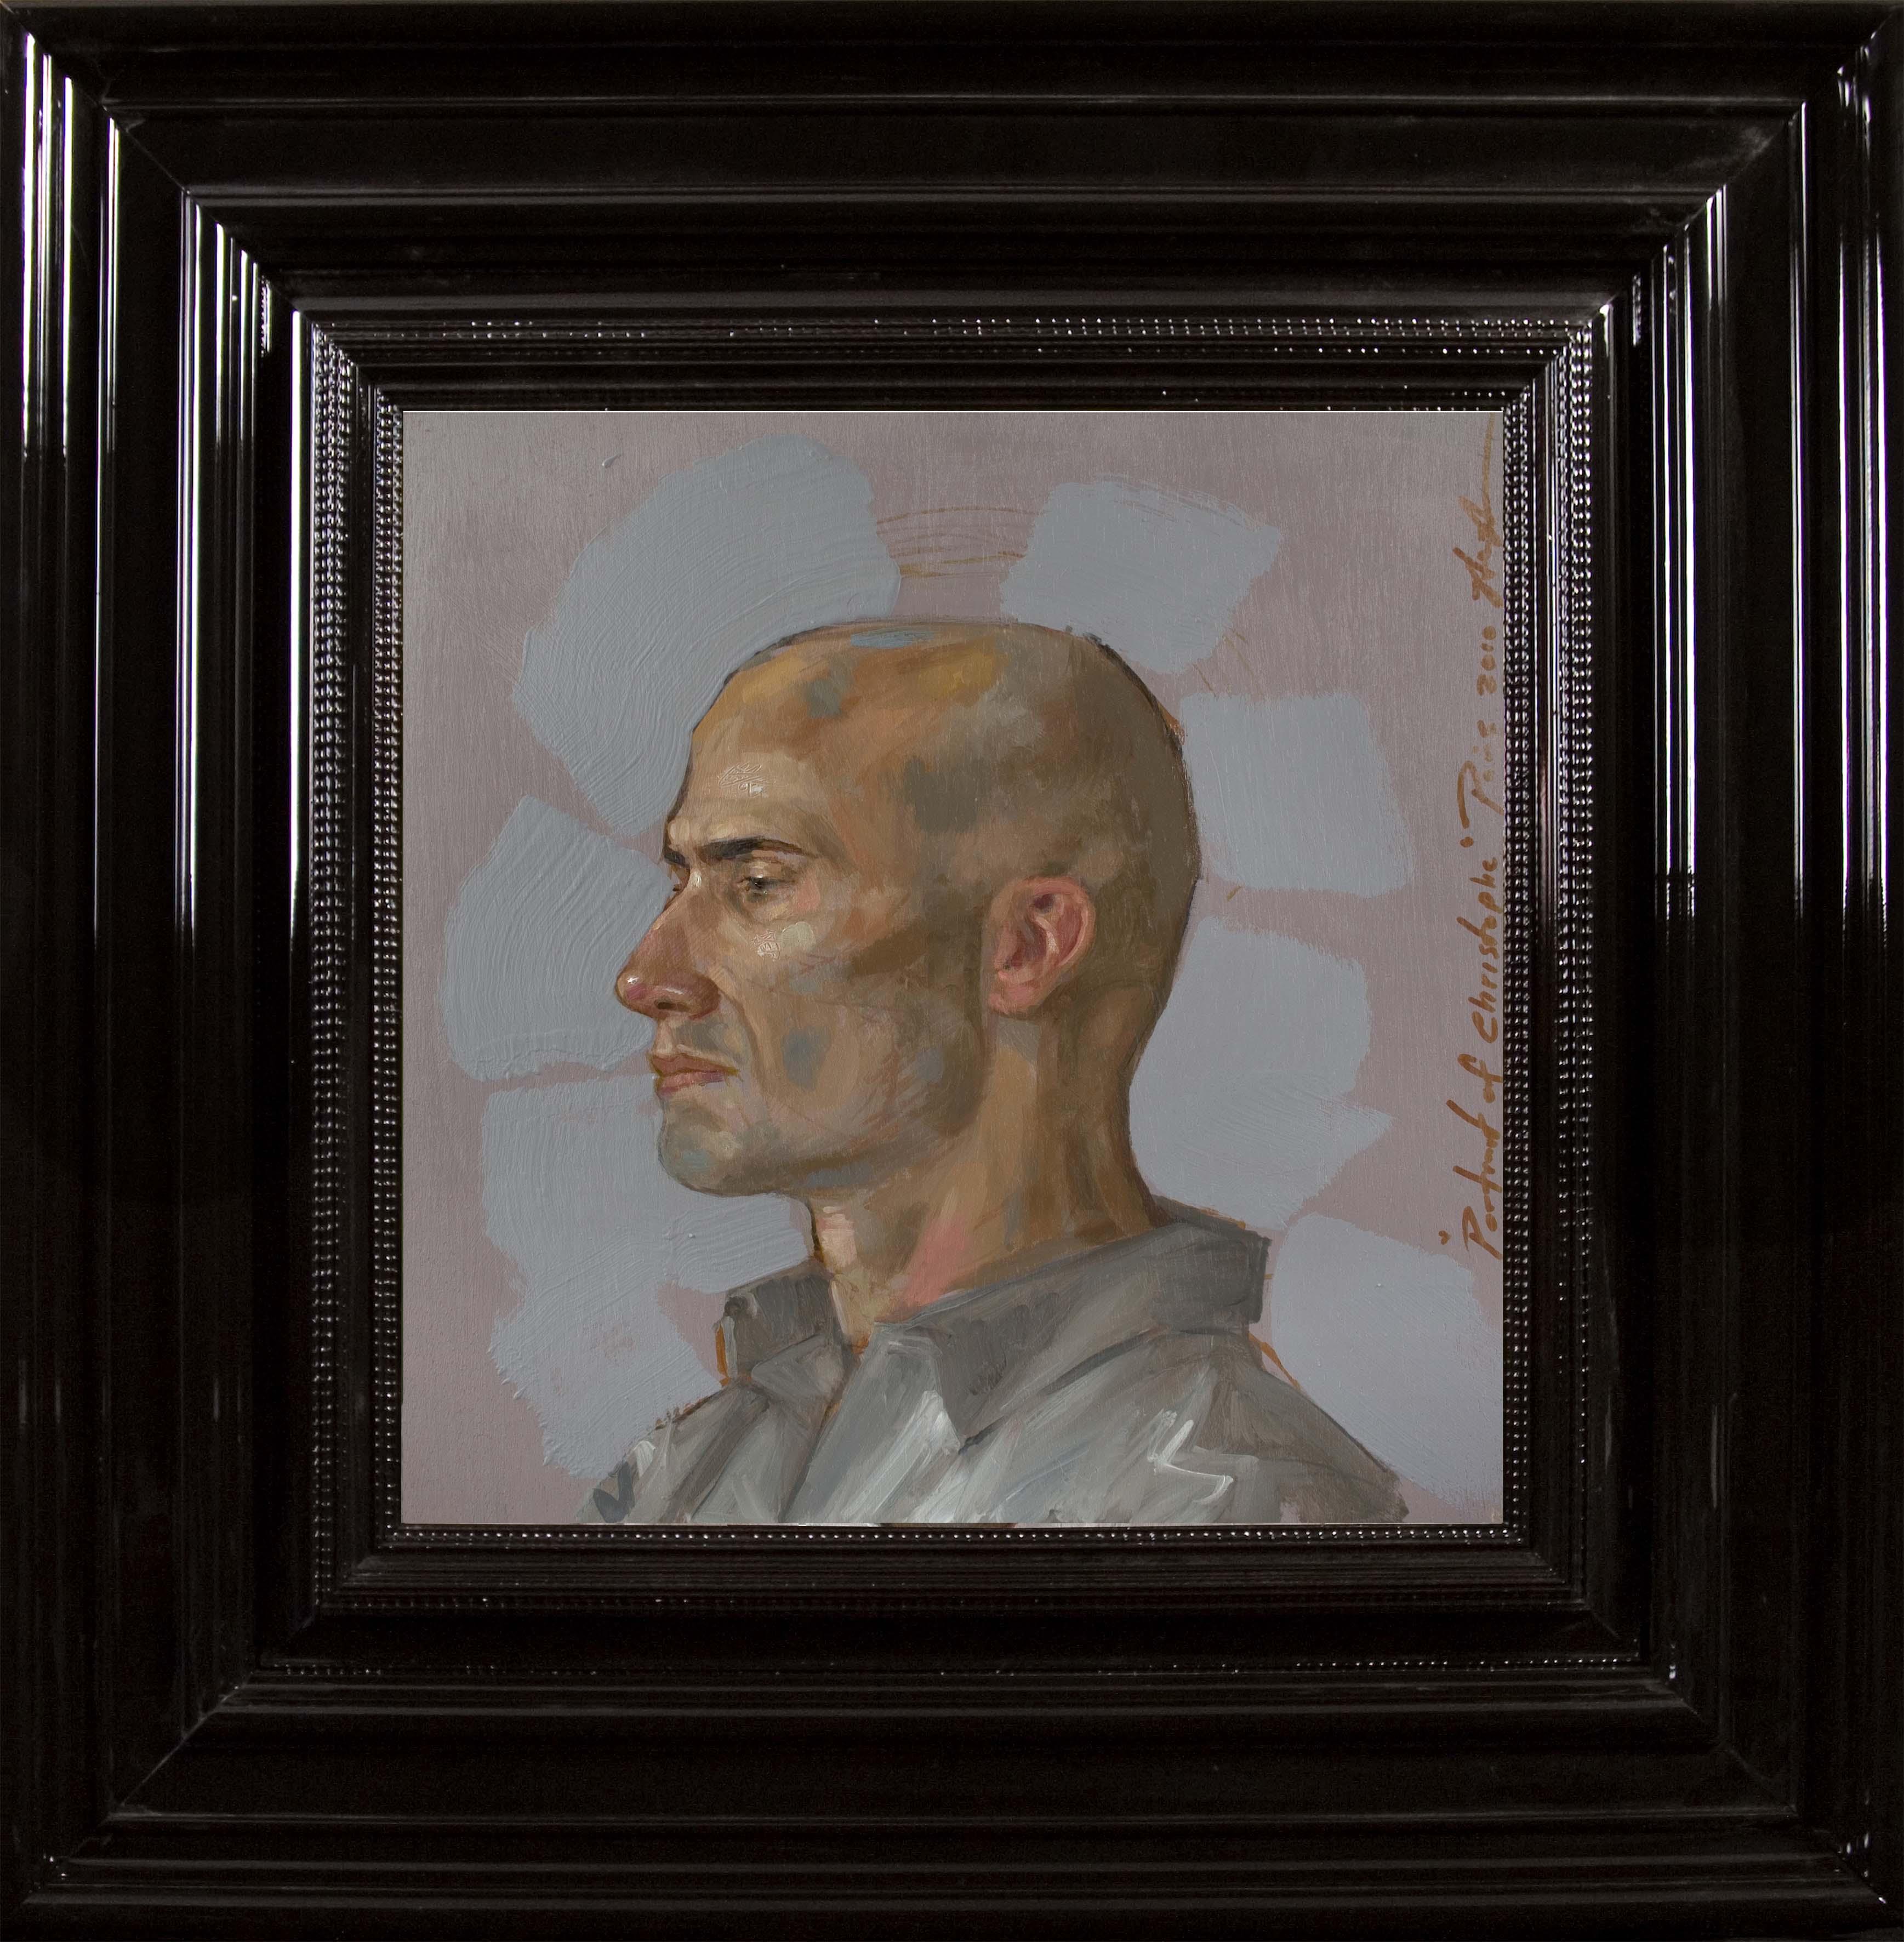 H Craig Hanna Portrait of Christophe 2010